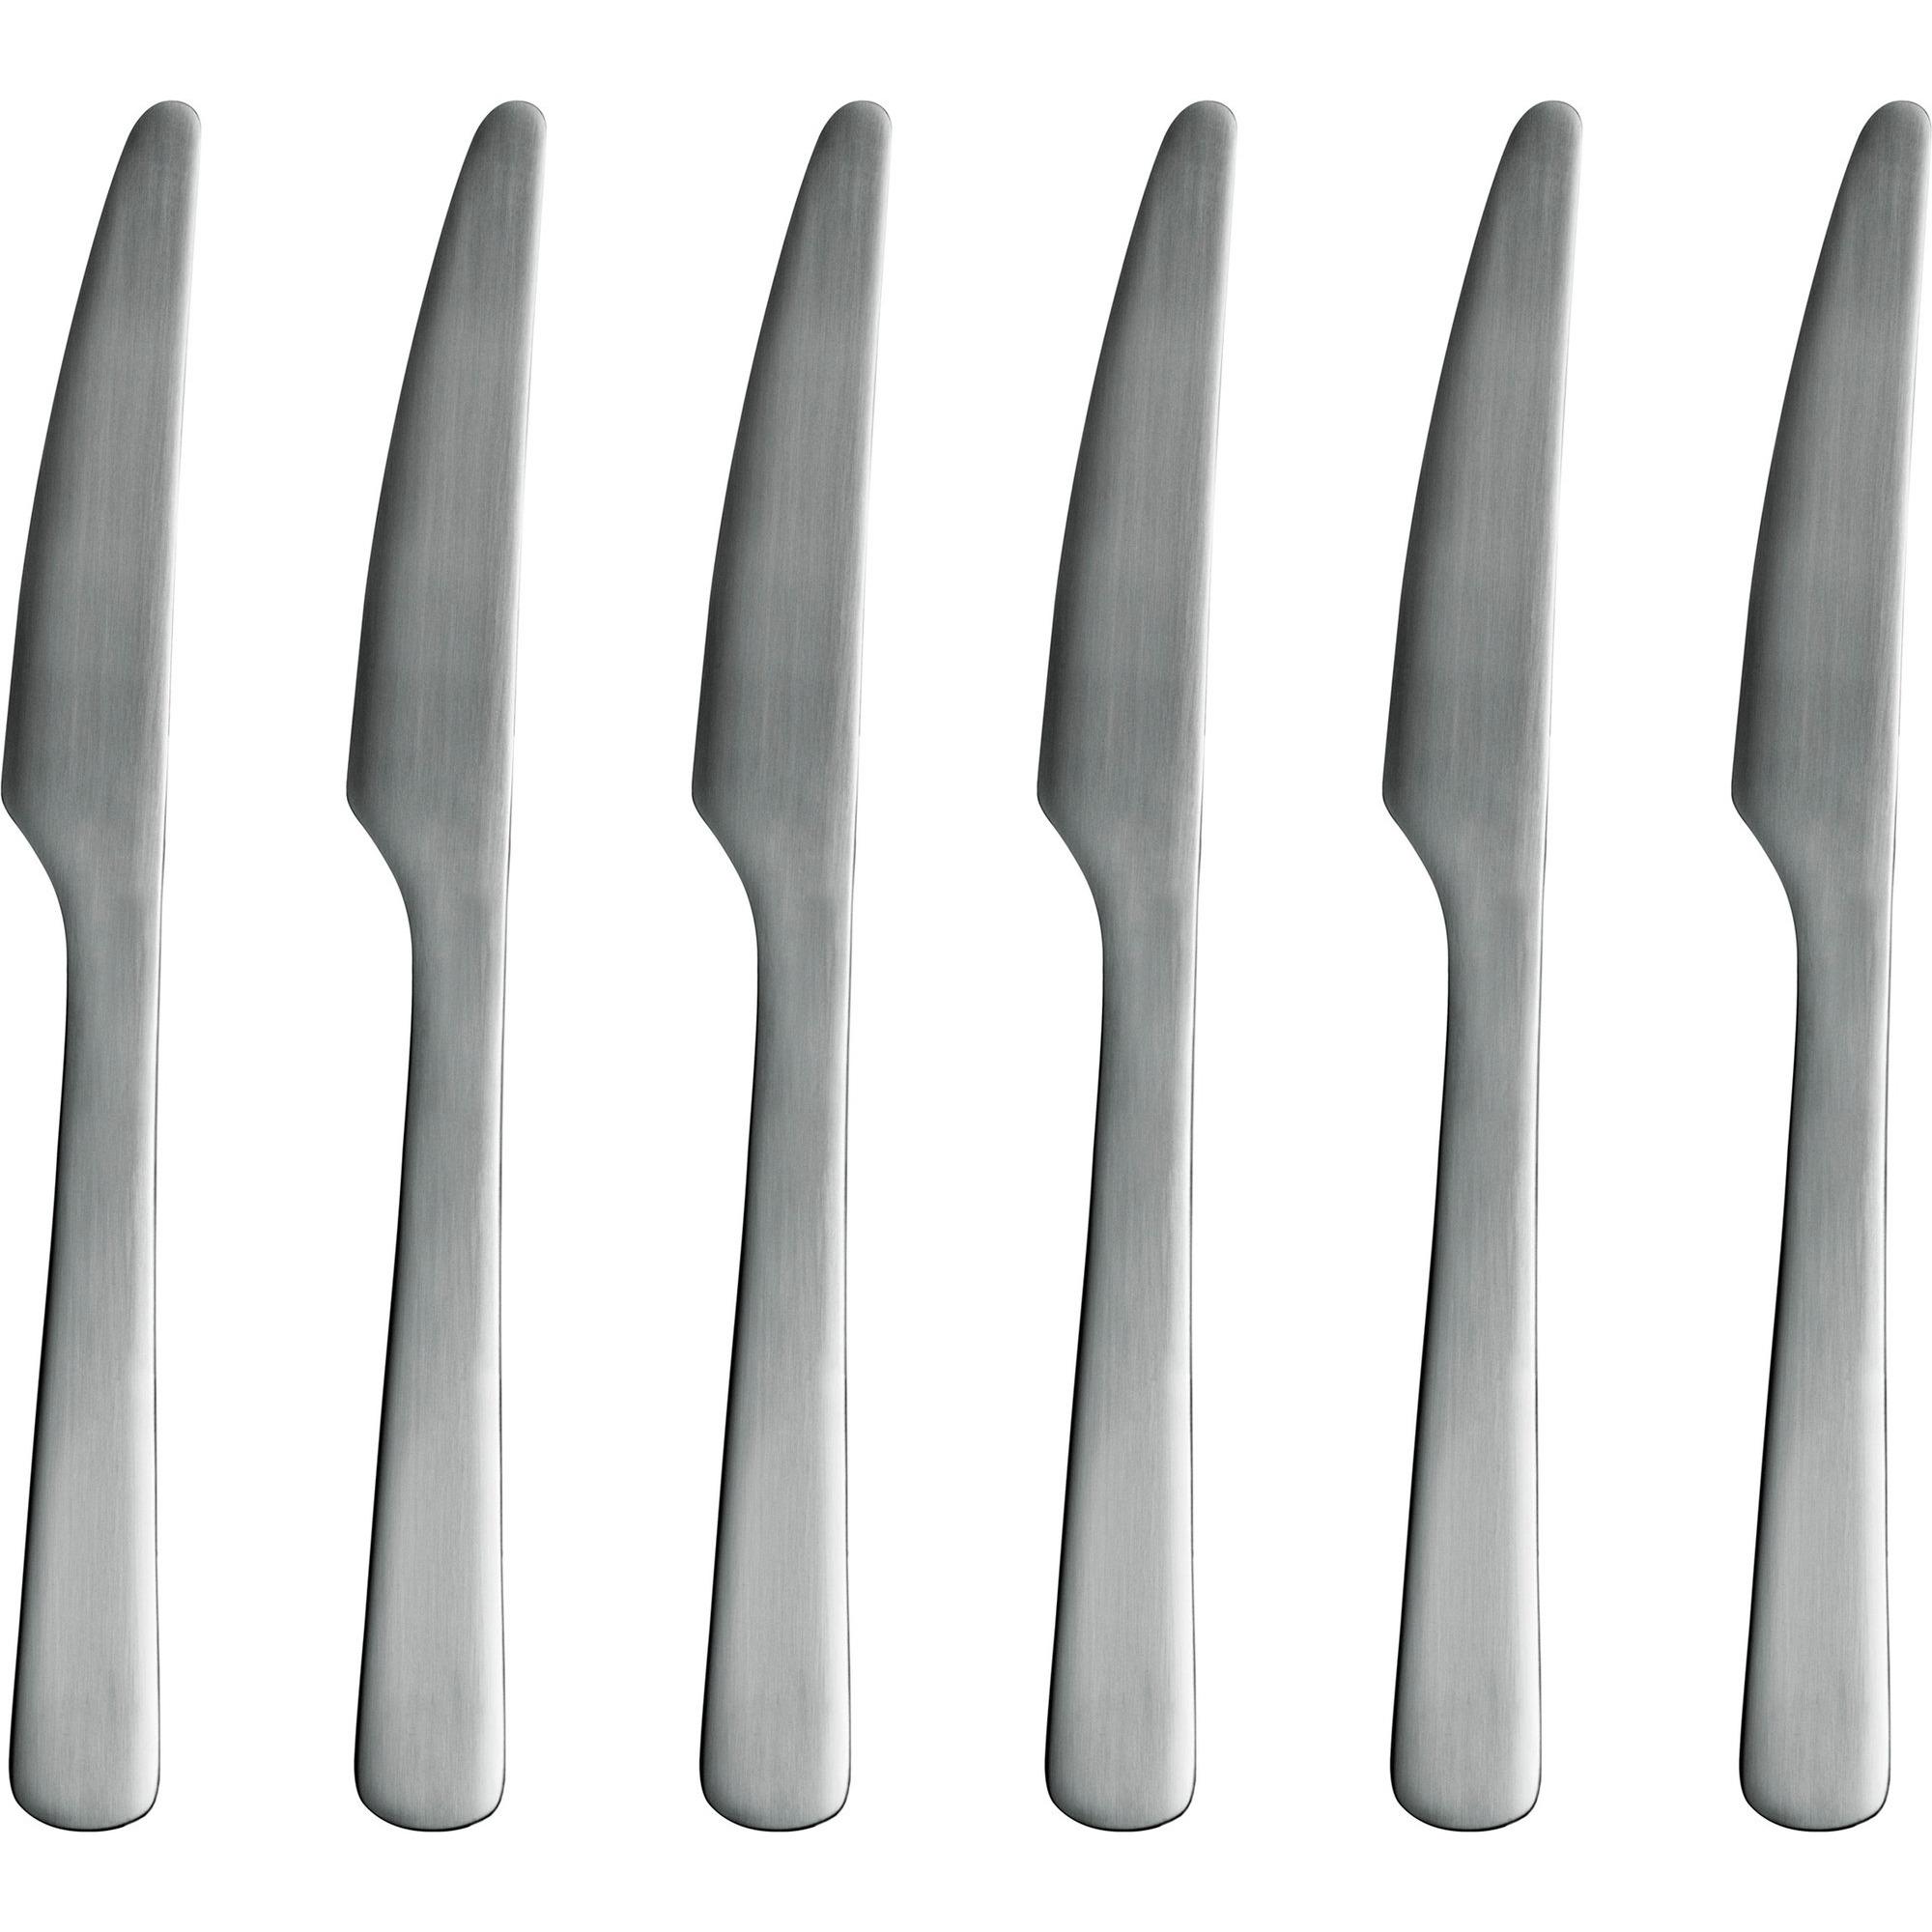 Normann Copenhagen Normann Knives – 6 pack Steel